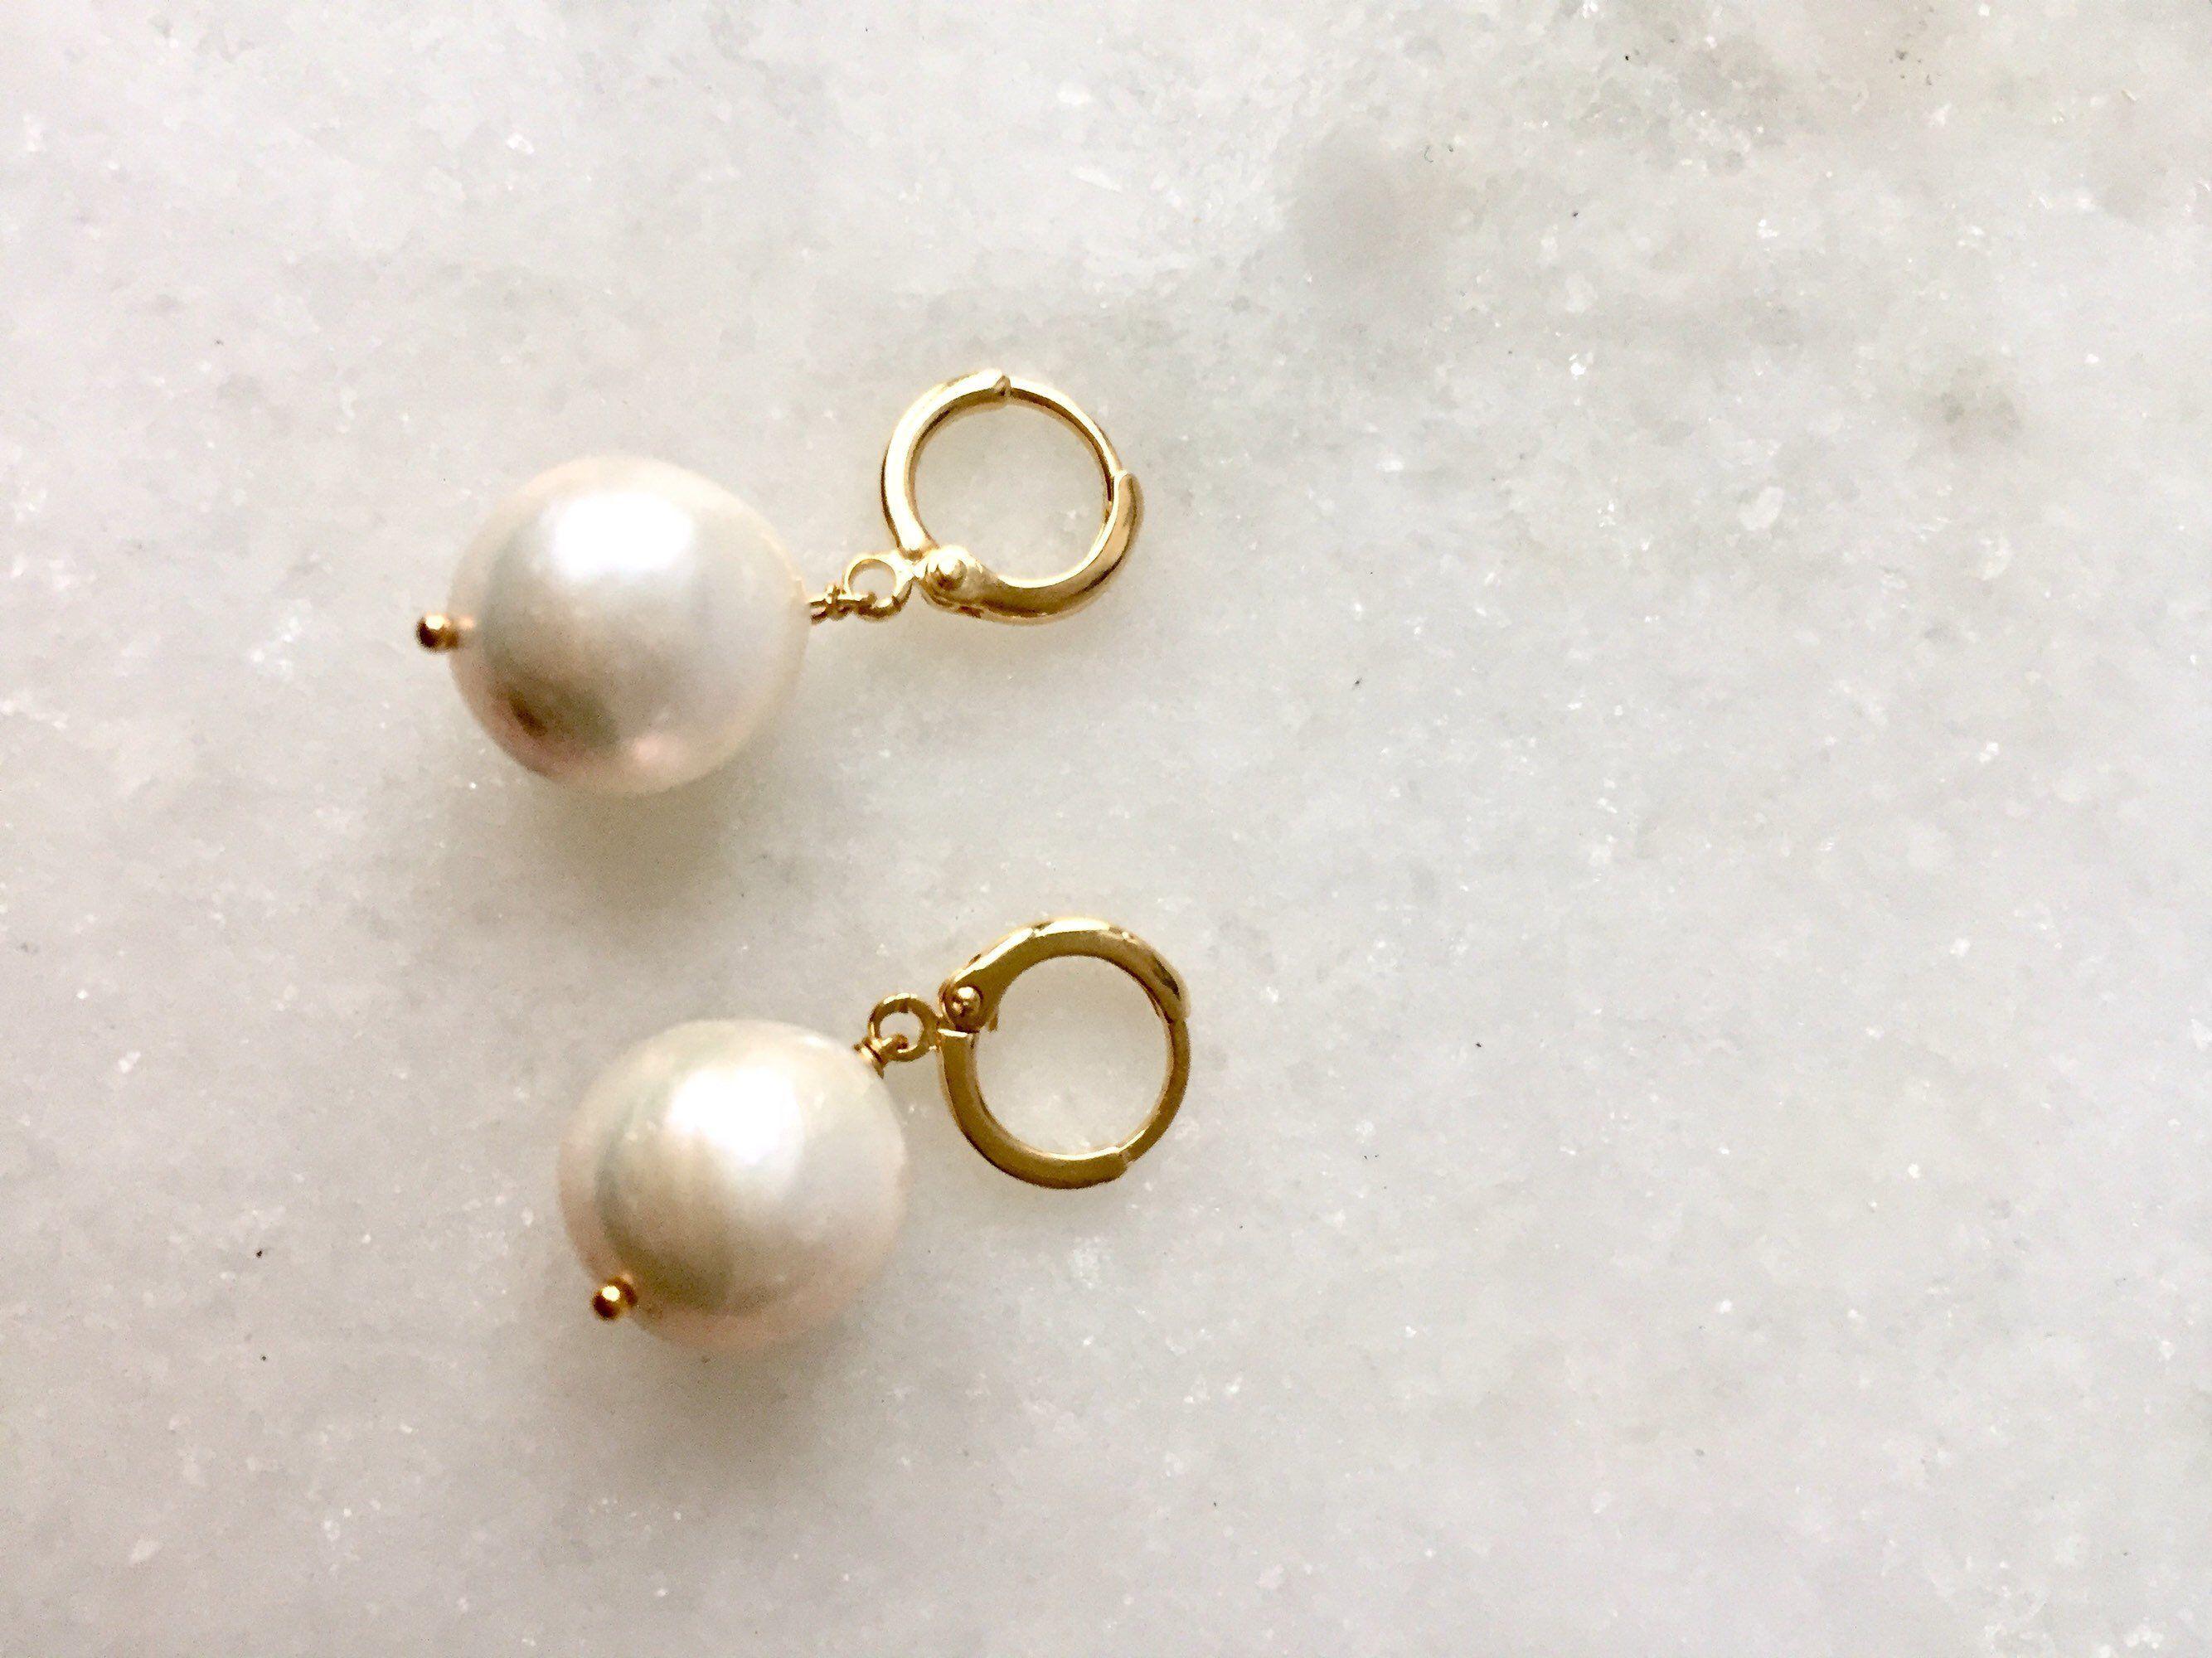 dabdcd75272c7 Pearl hoop earring, baroque pearl earring charm hoop earring gold ...